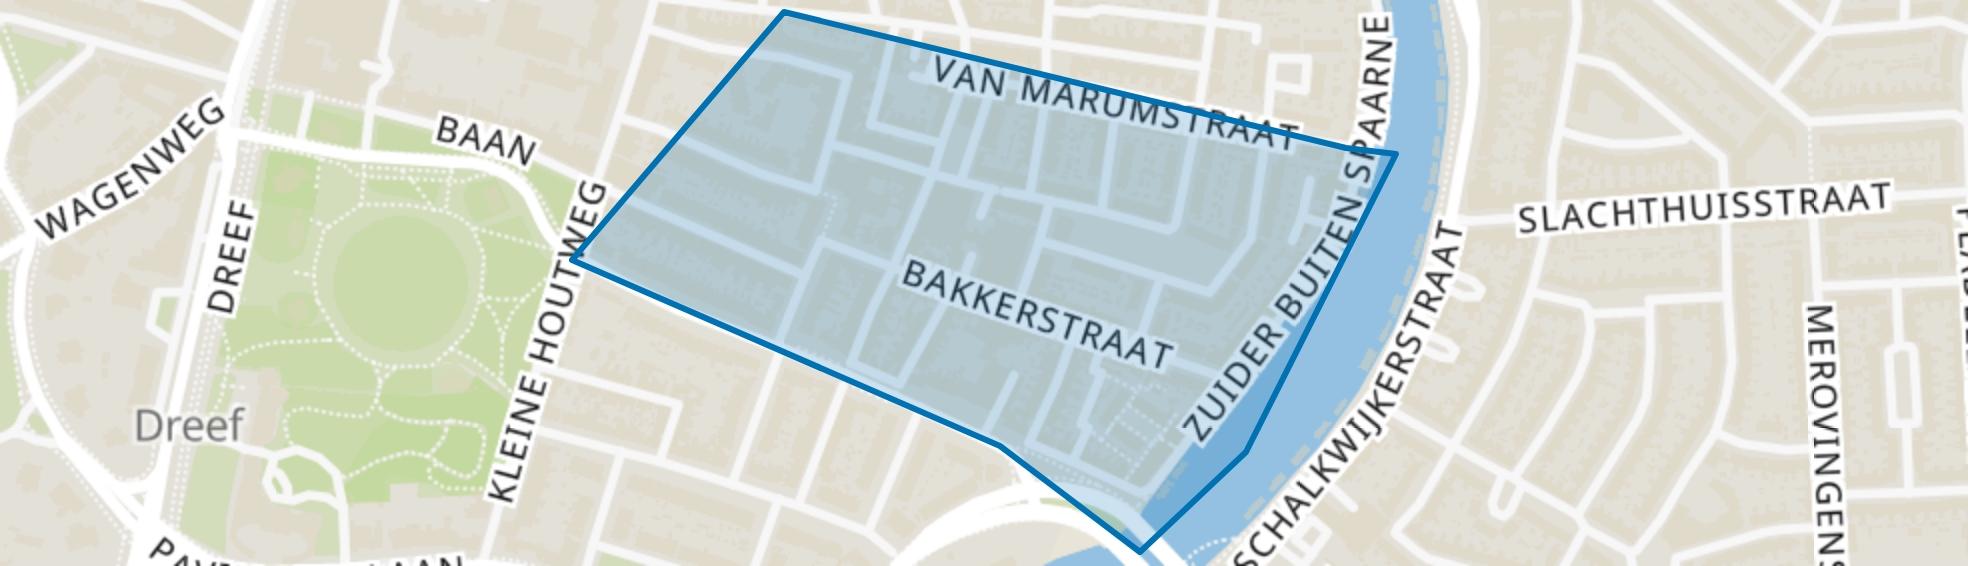 Rozenprieel-zuid, Haarlem map